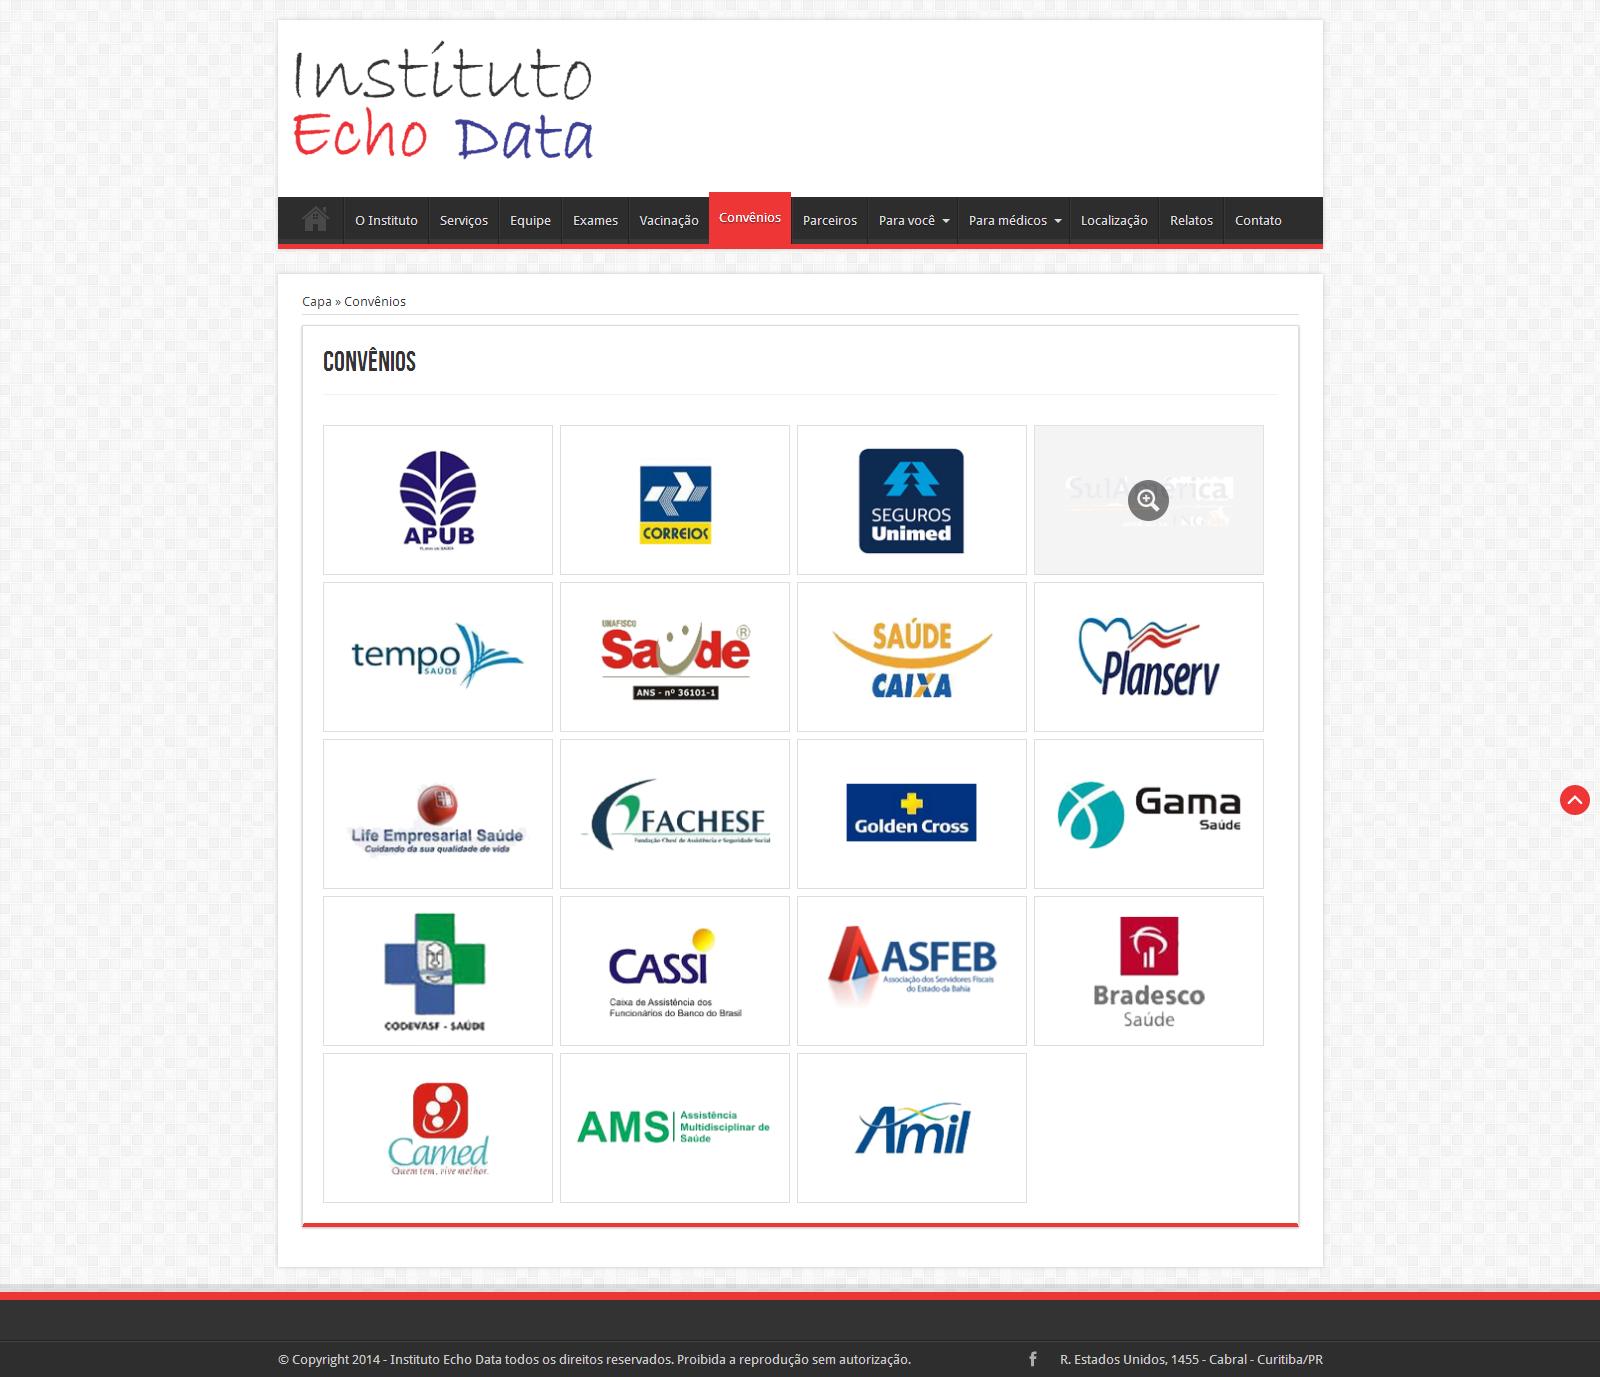 Instituto Echodata